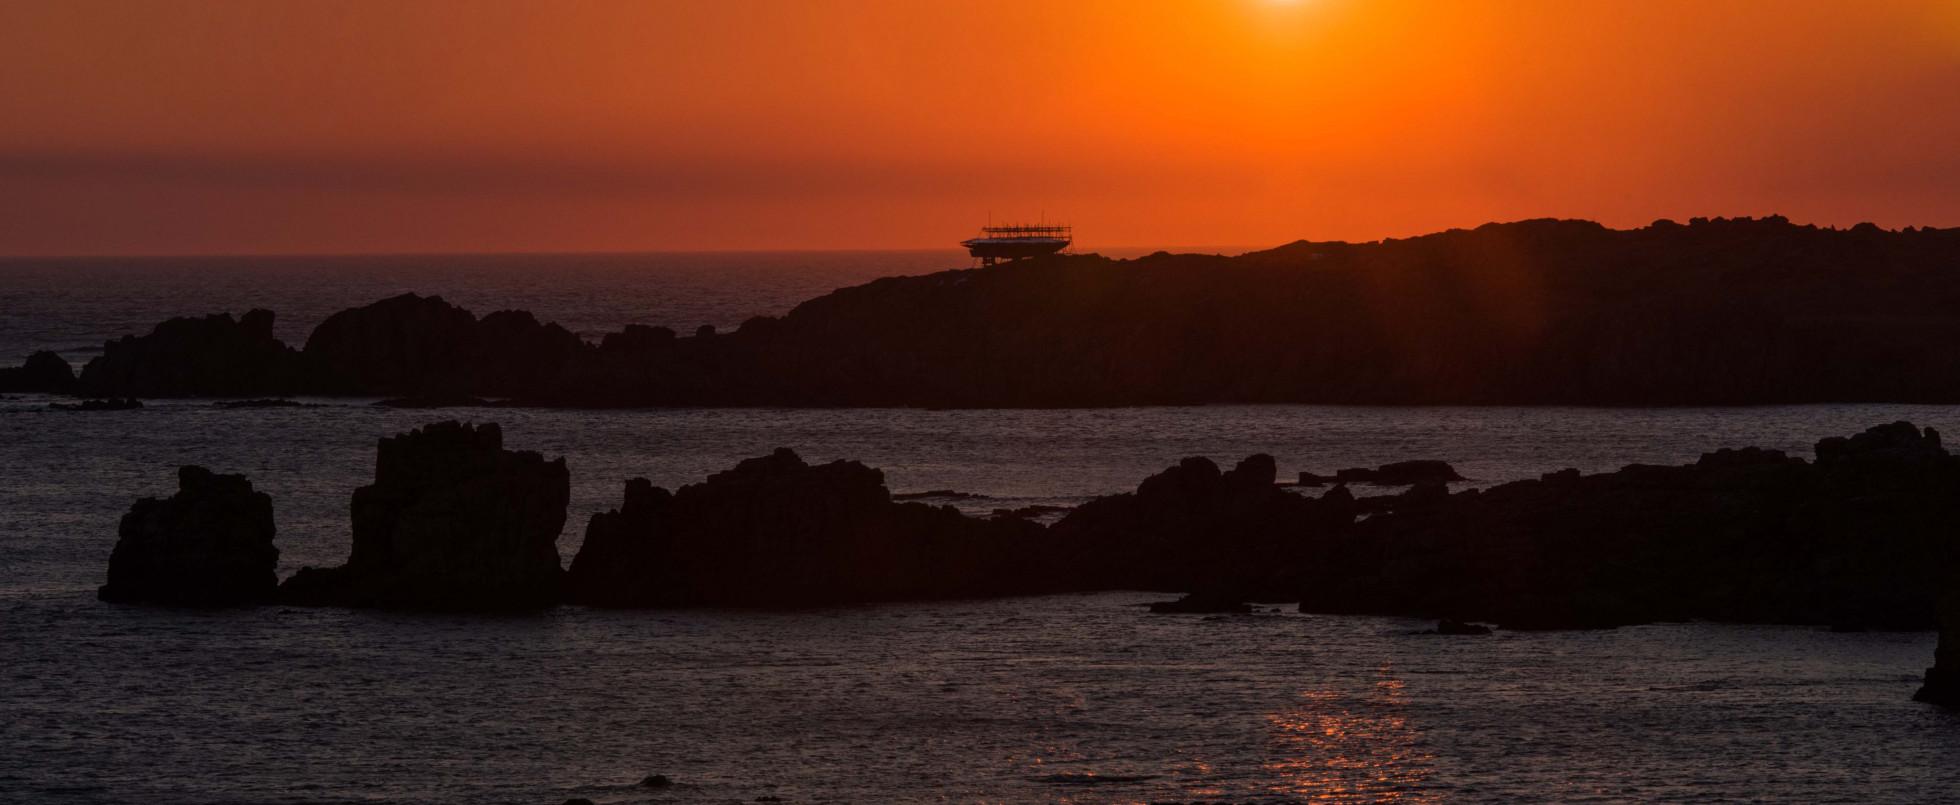 Explore the Landing Site of the Millennium Falcon